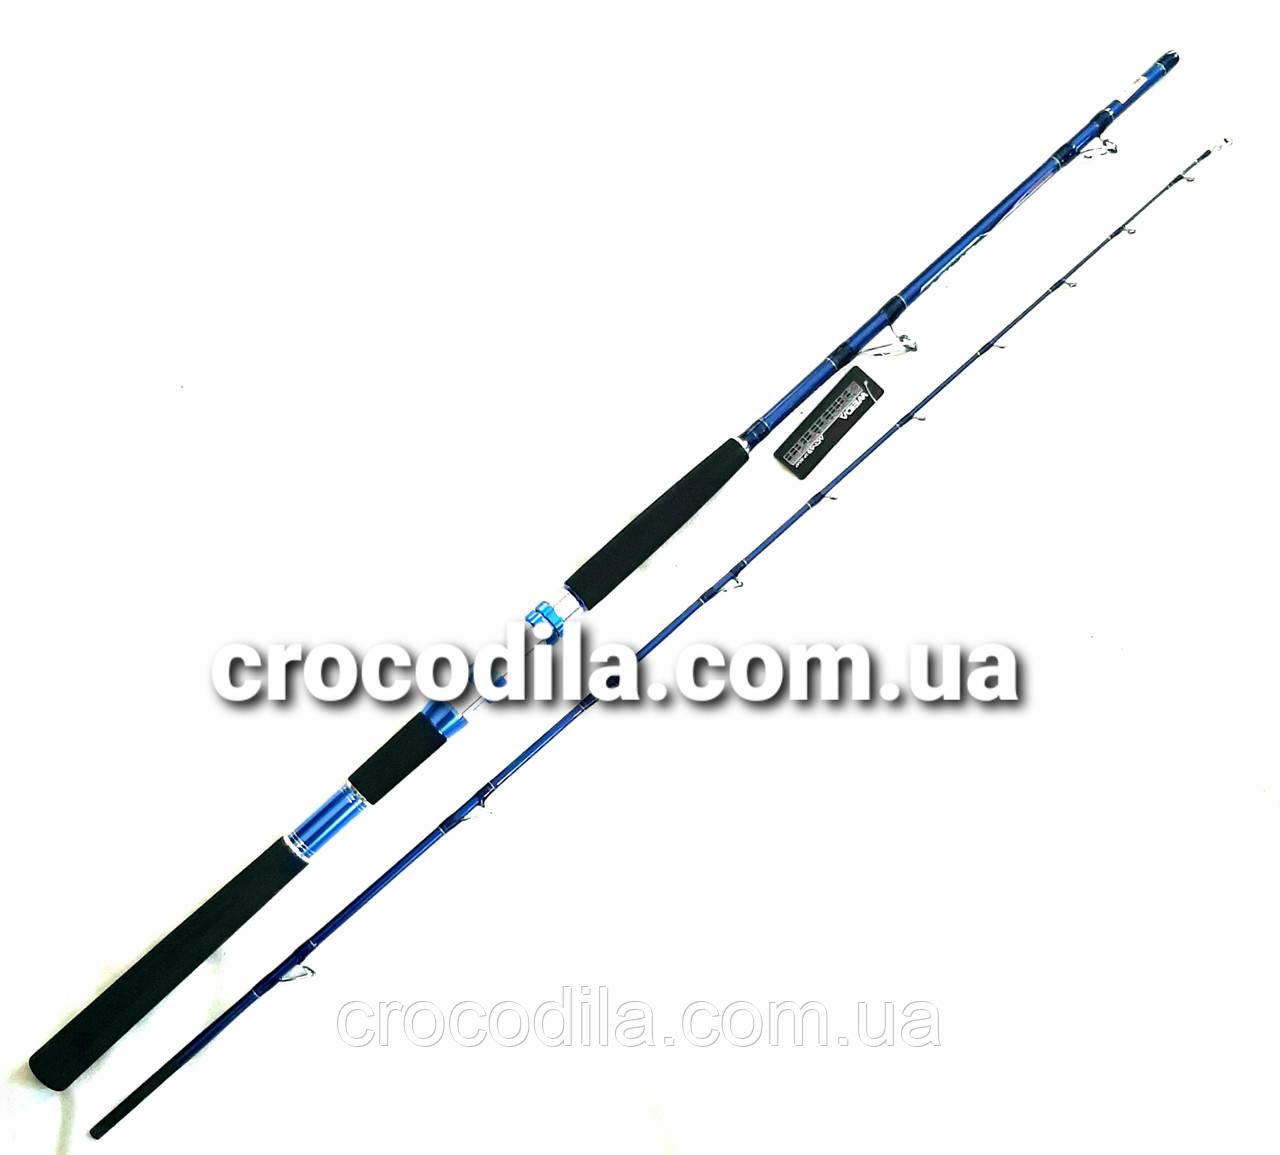 Троллинговое удилище Weida Achab XP BOAT 210 150 грамм